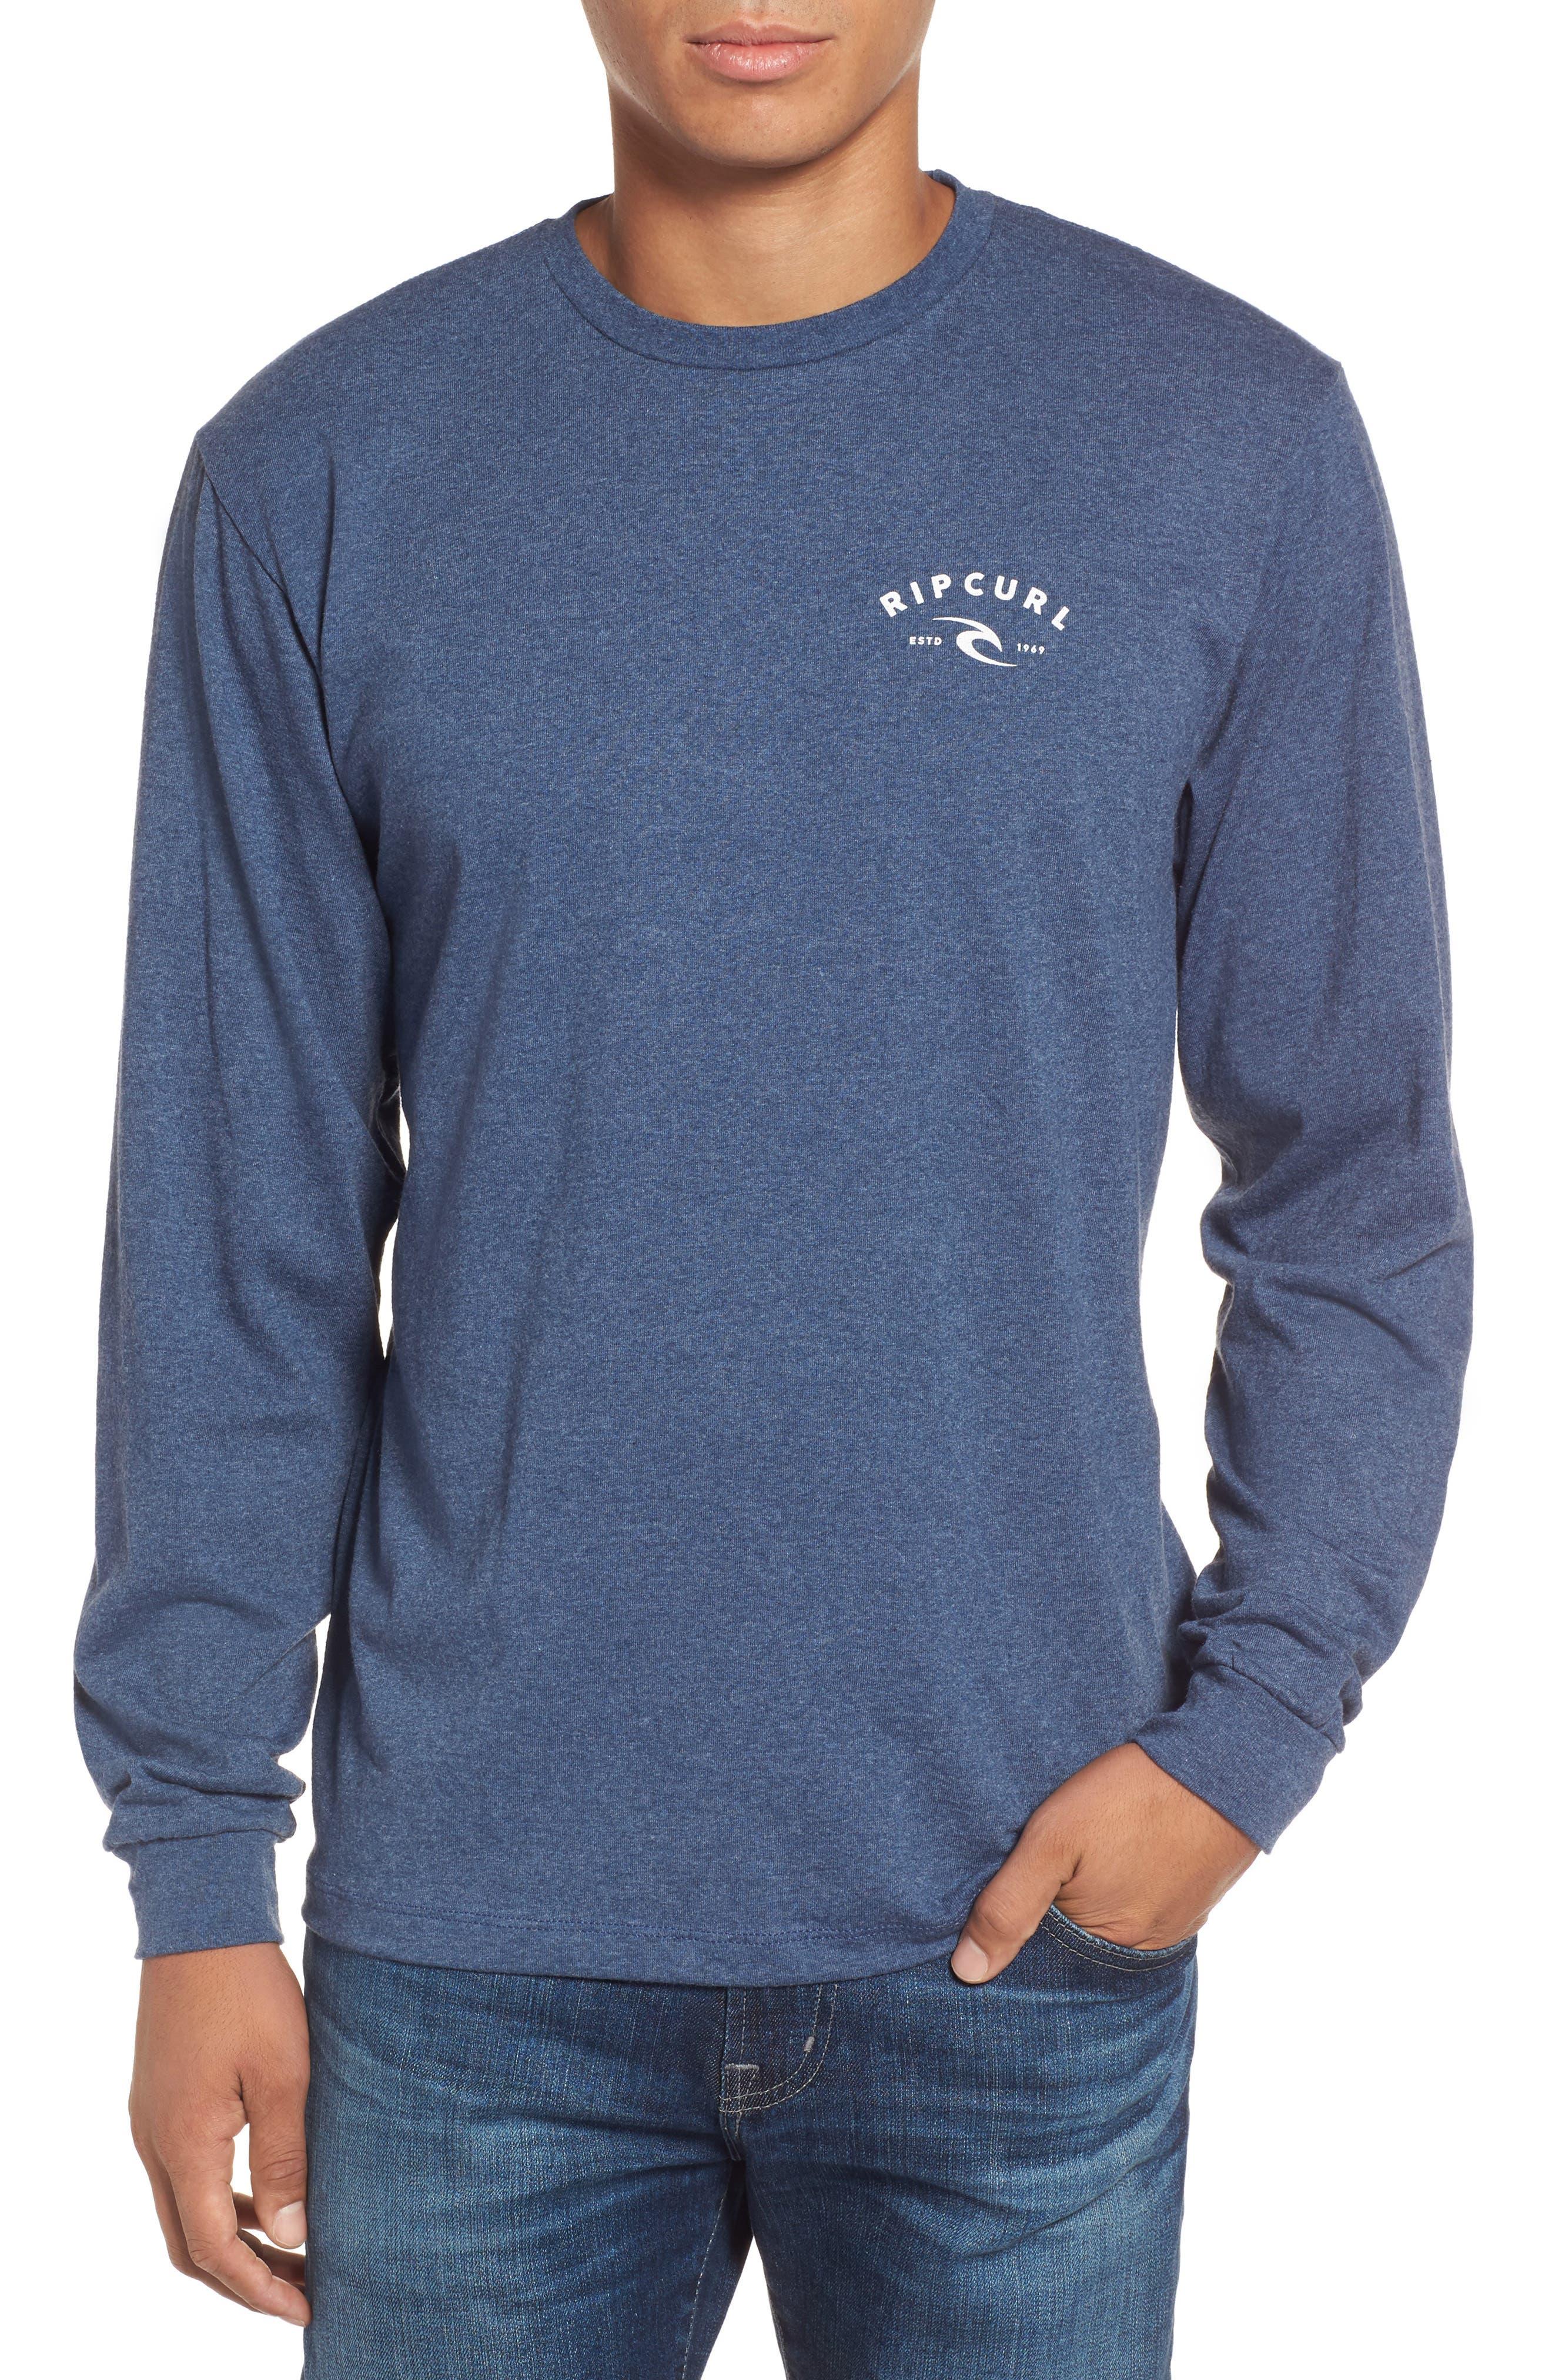 Down South Custom Graphic T-Shirt,                             Main thumbnail 1, color,                             410